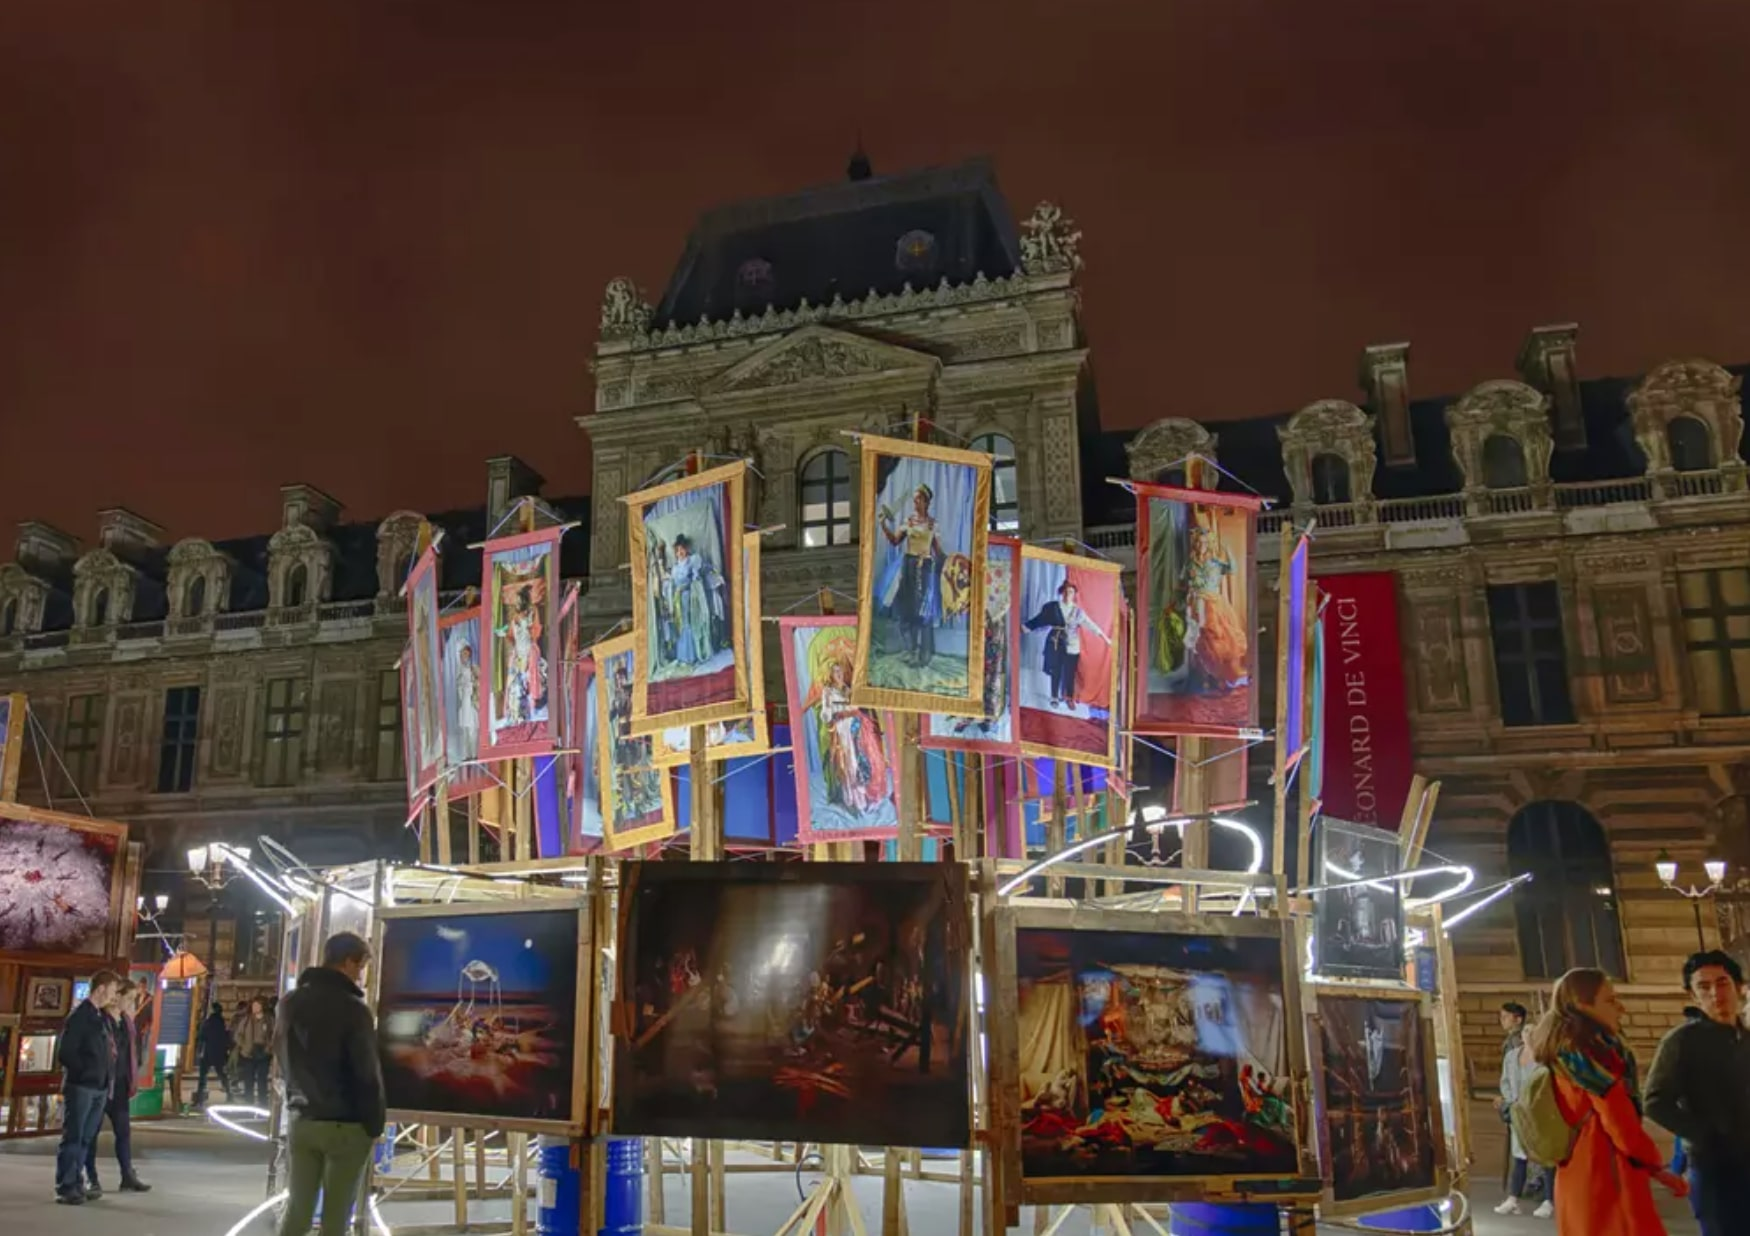 The Parisian art scene during Covid